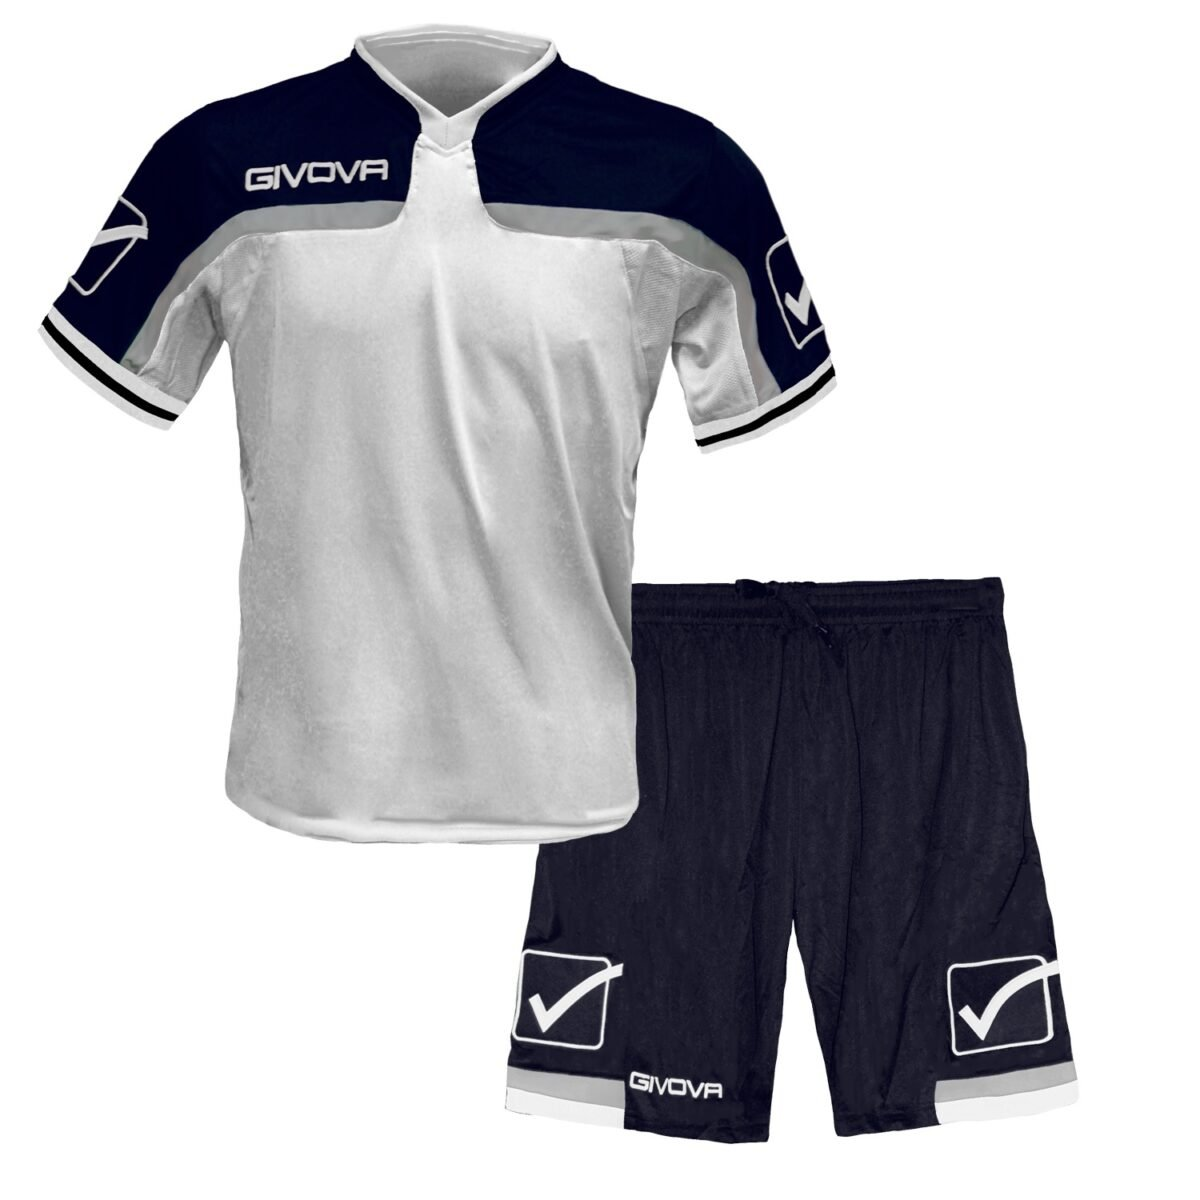 Kit calcio Givova